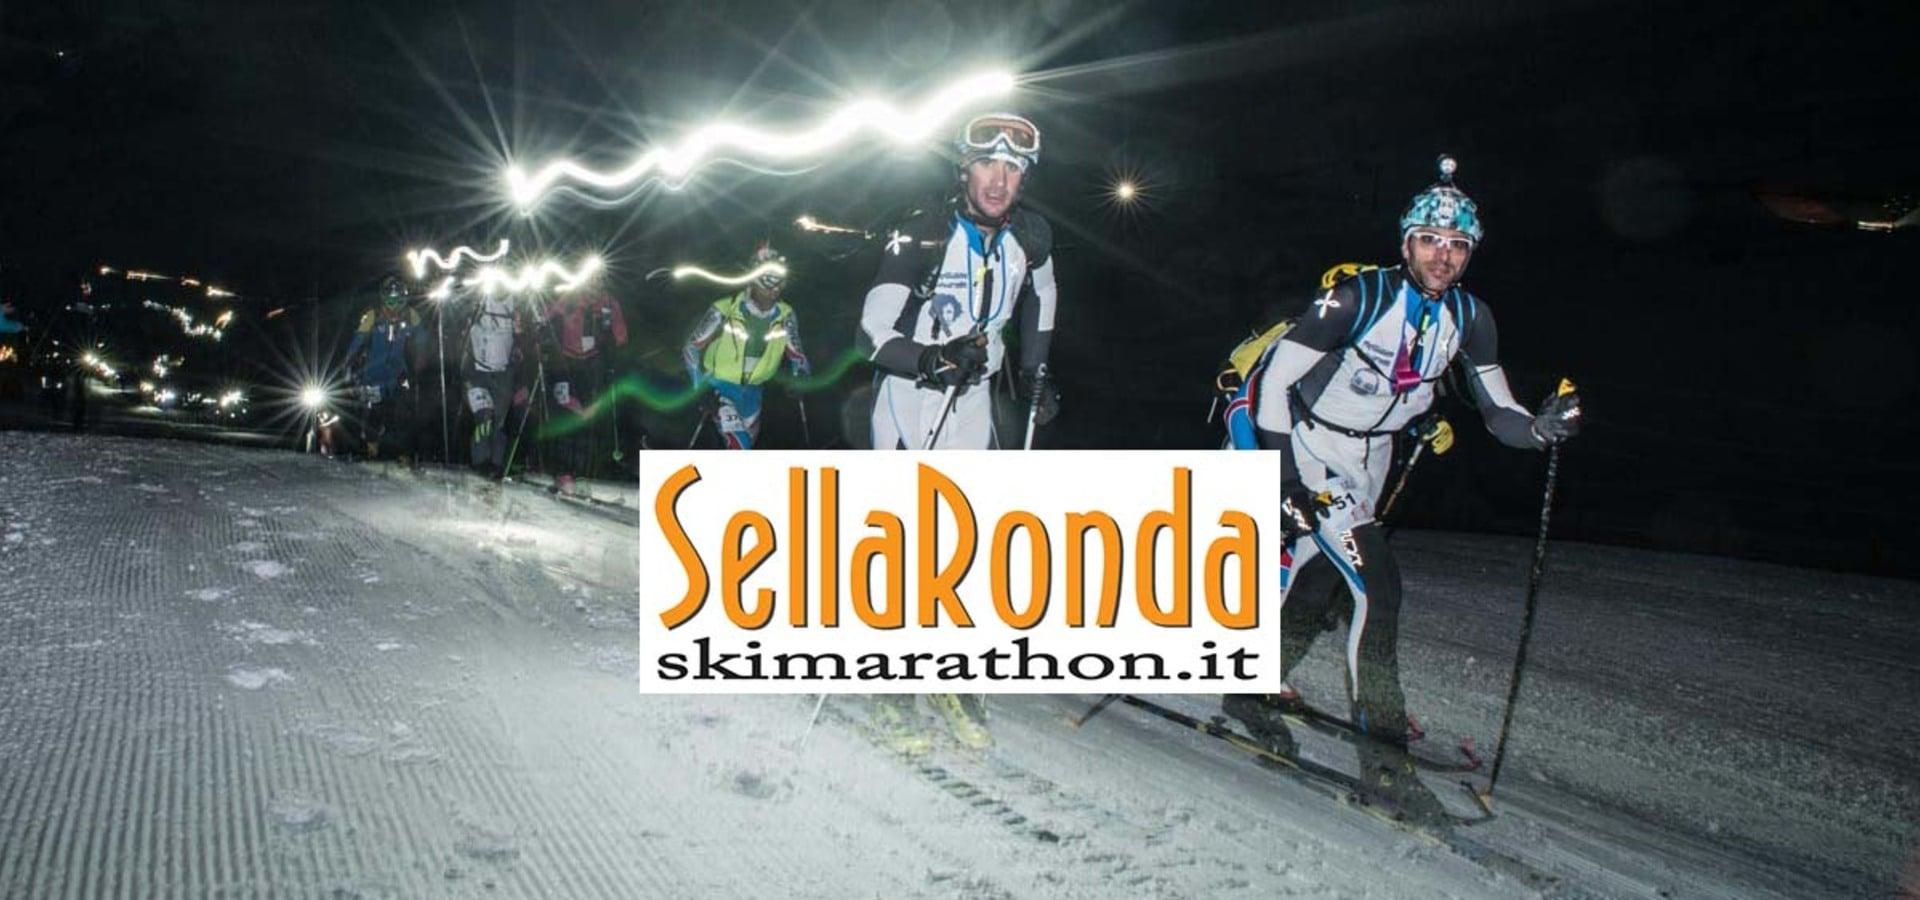 16.03.18 Sellaronda Skimarathon